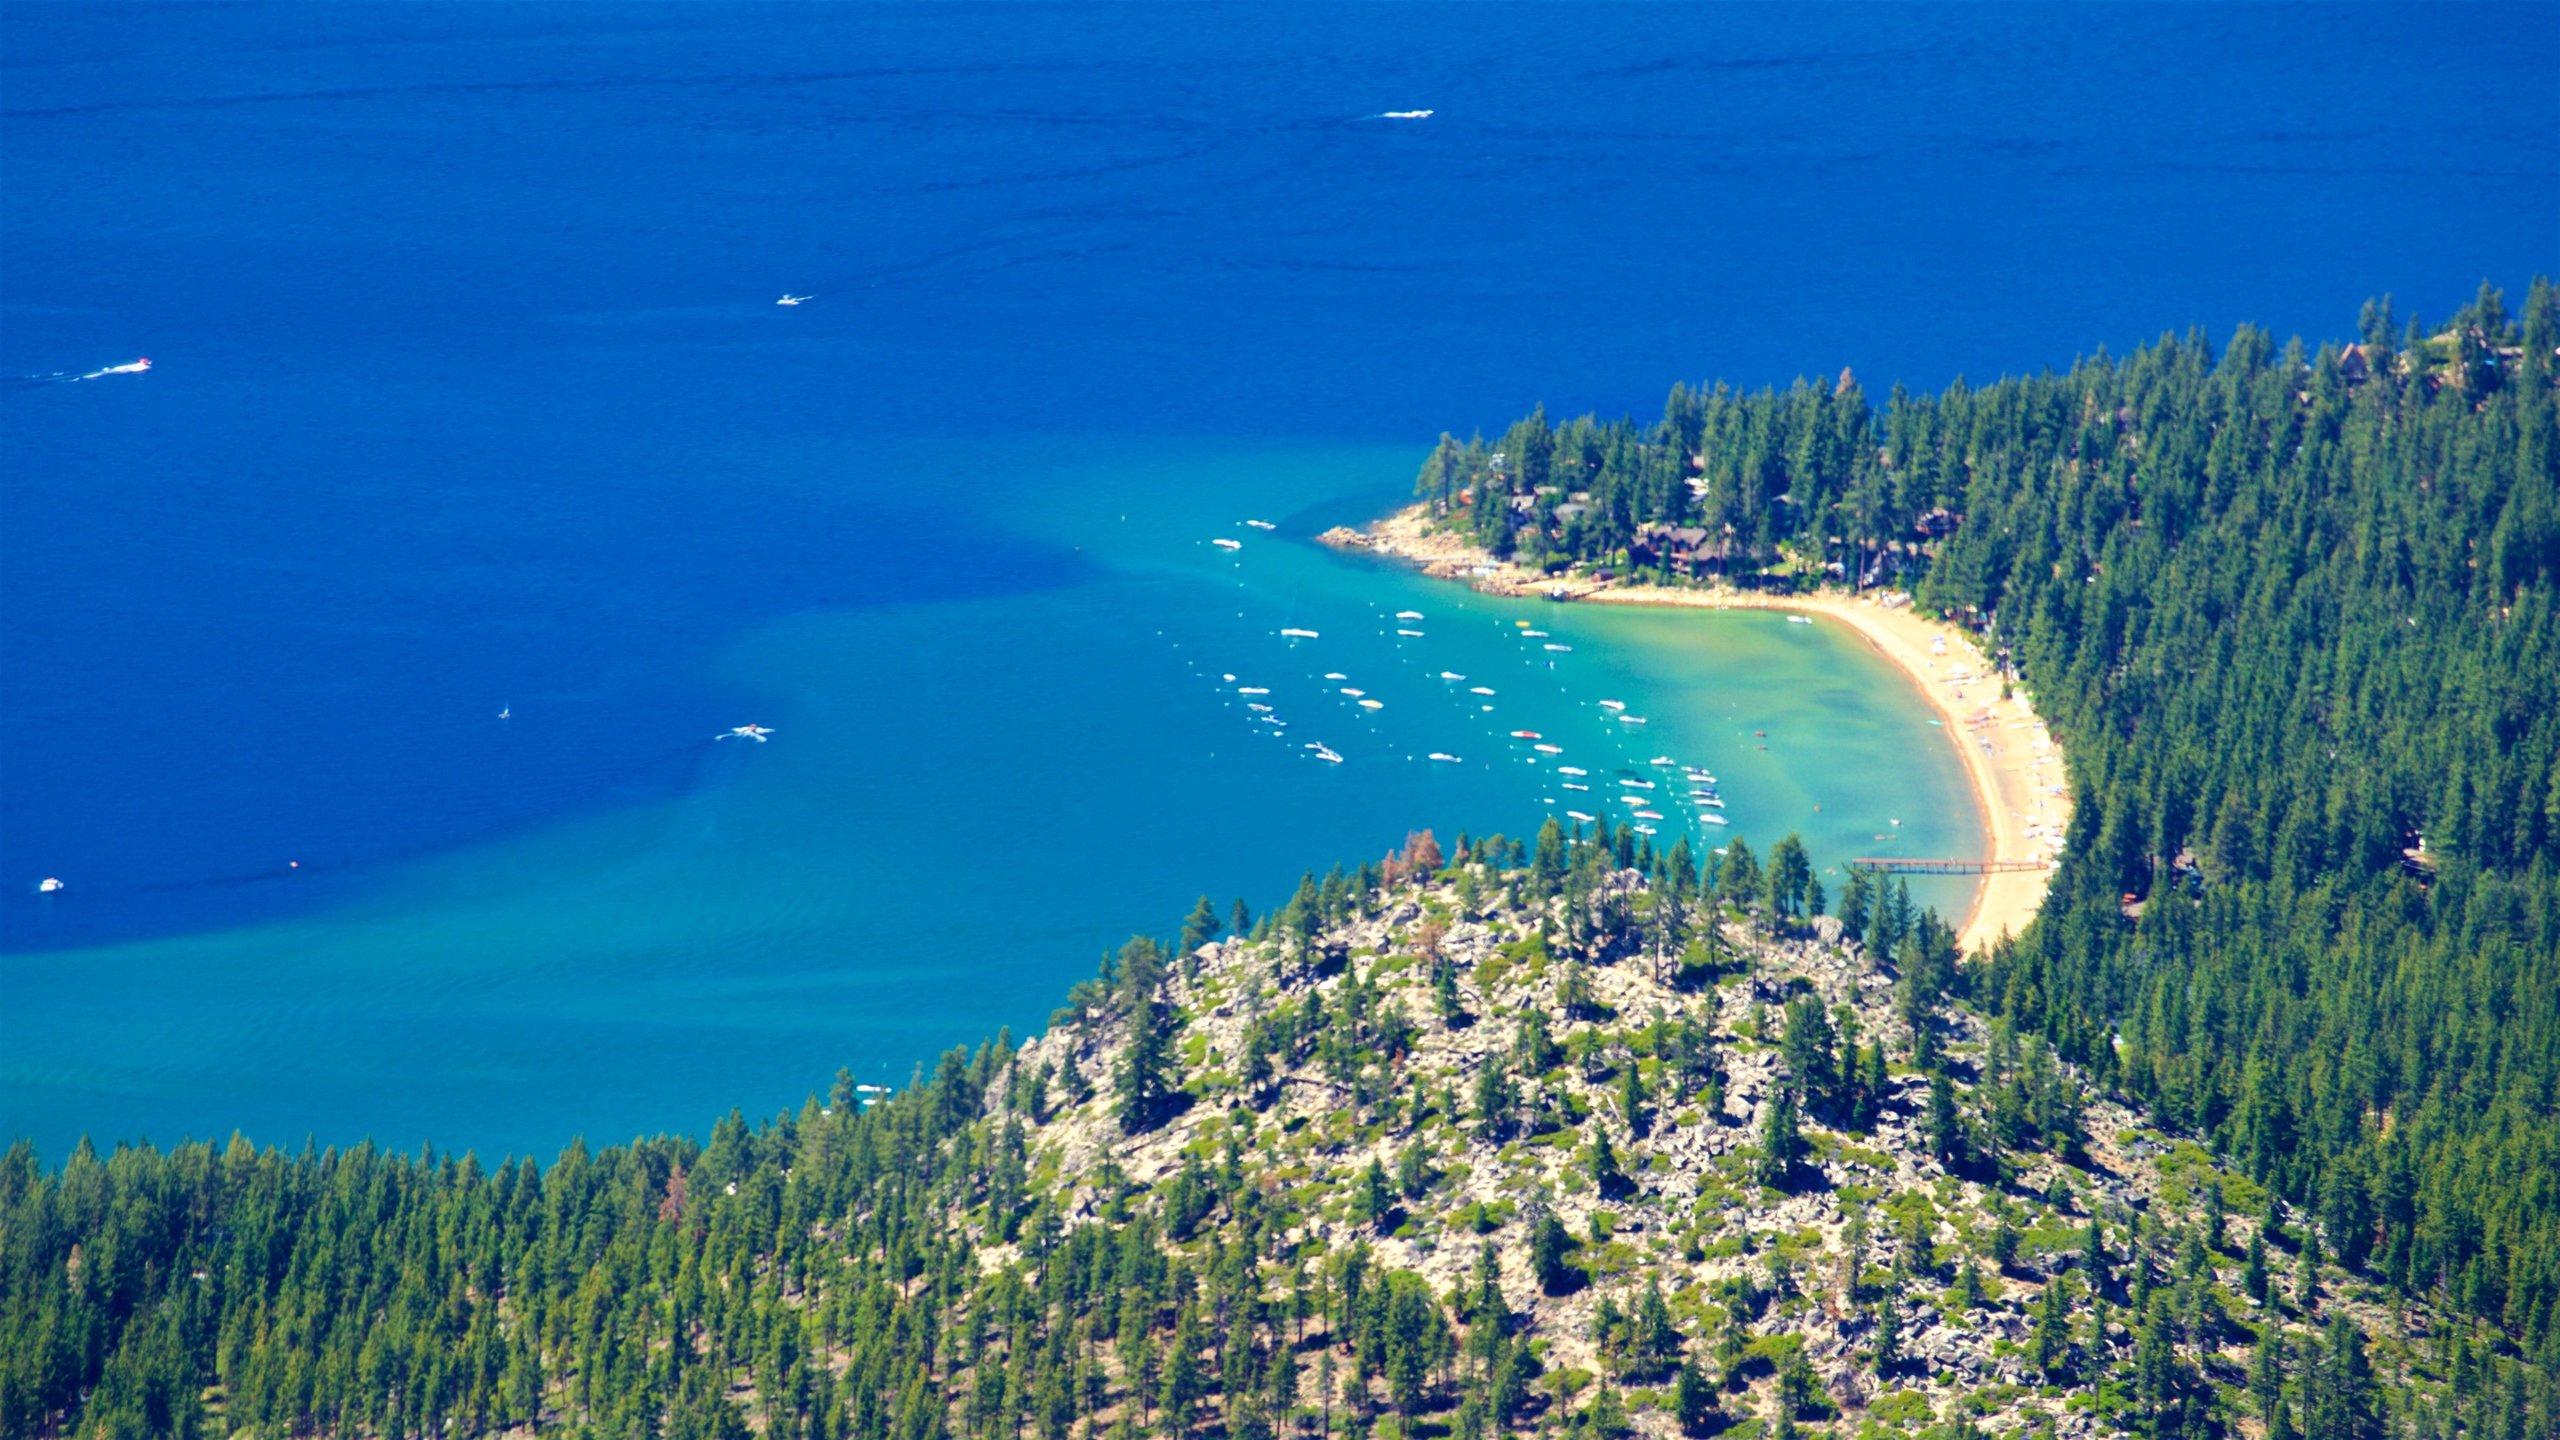 Heavenly Gondola, South Lake Tahoe, California, United States of America